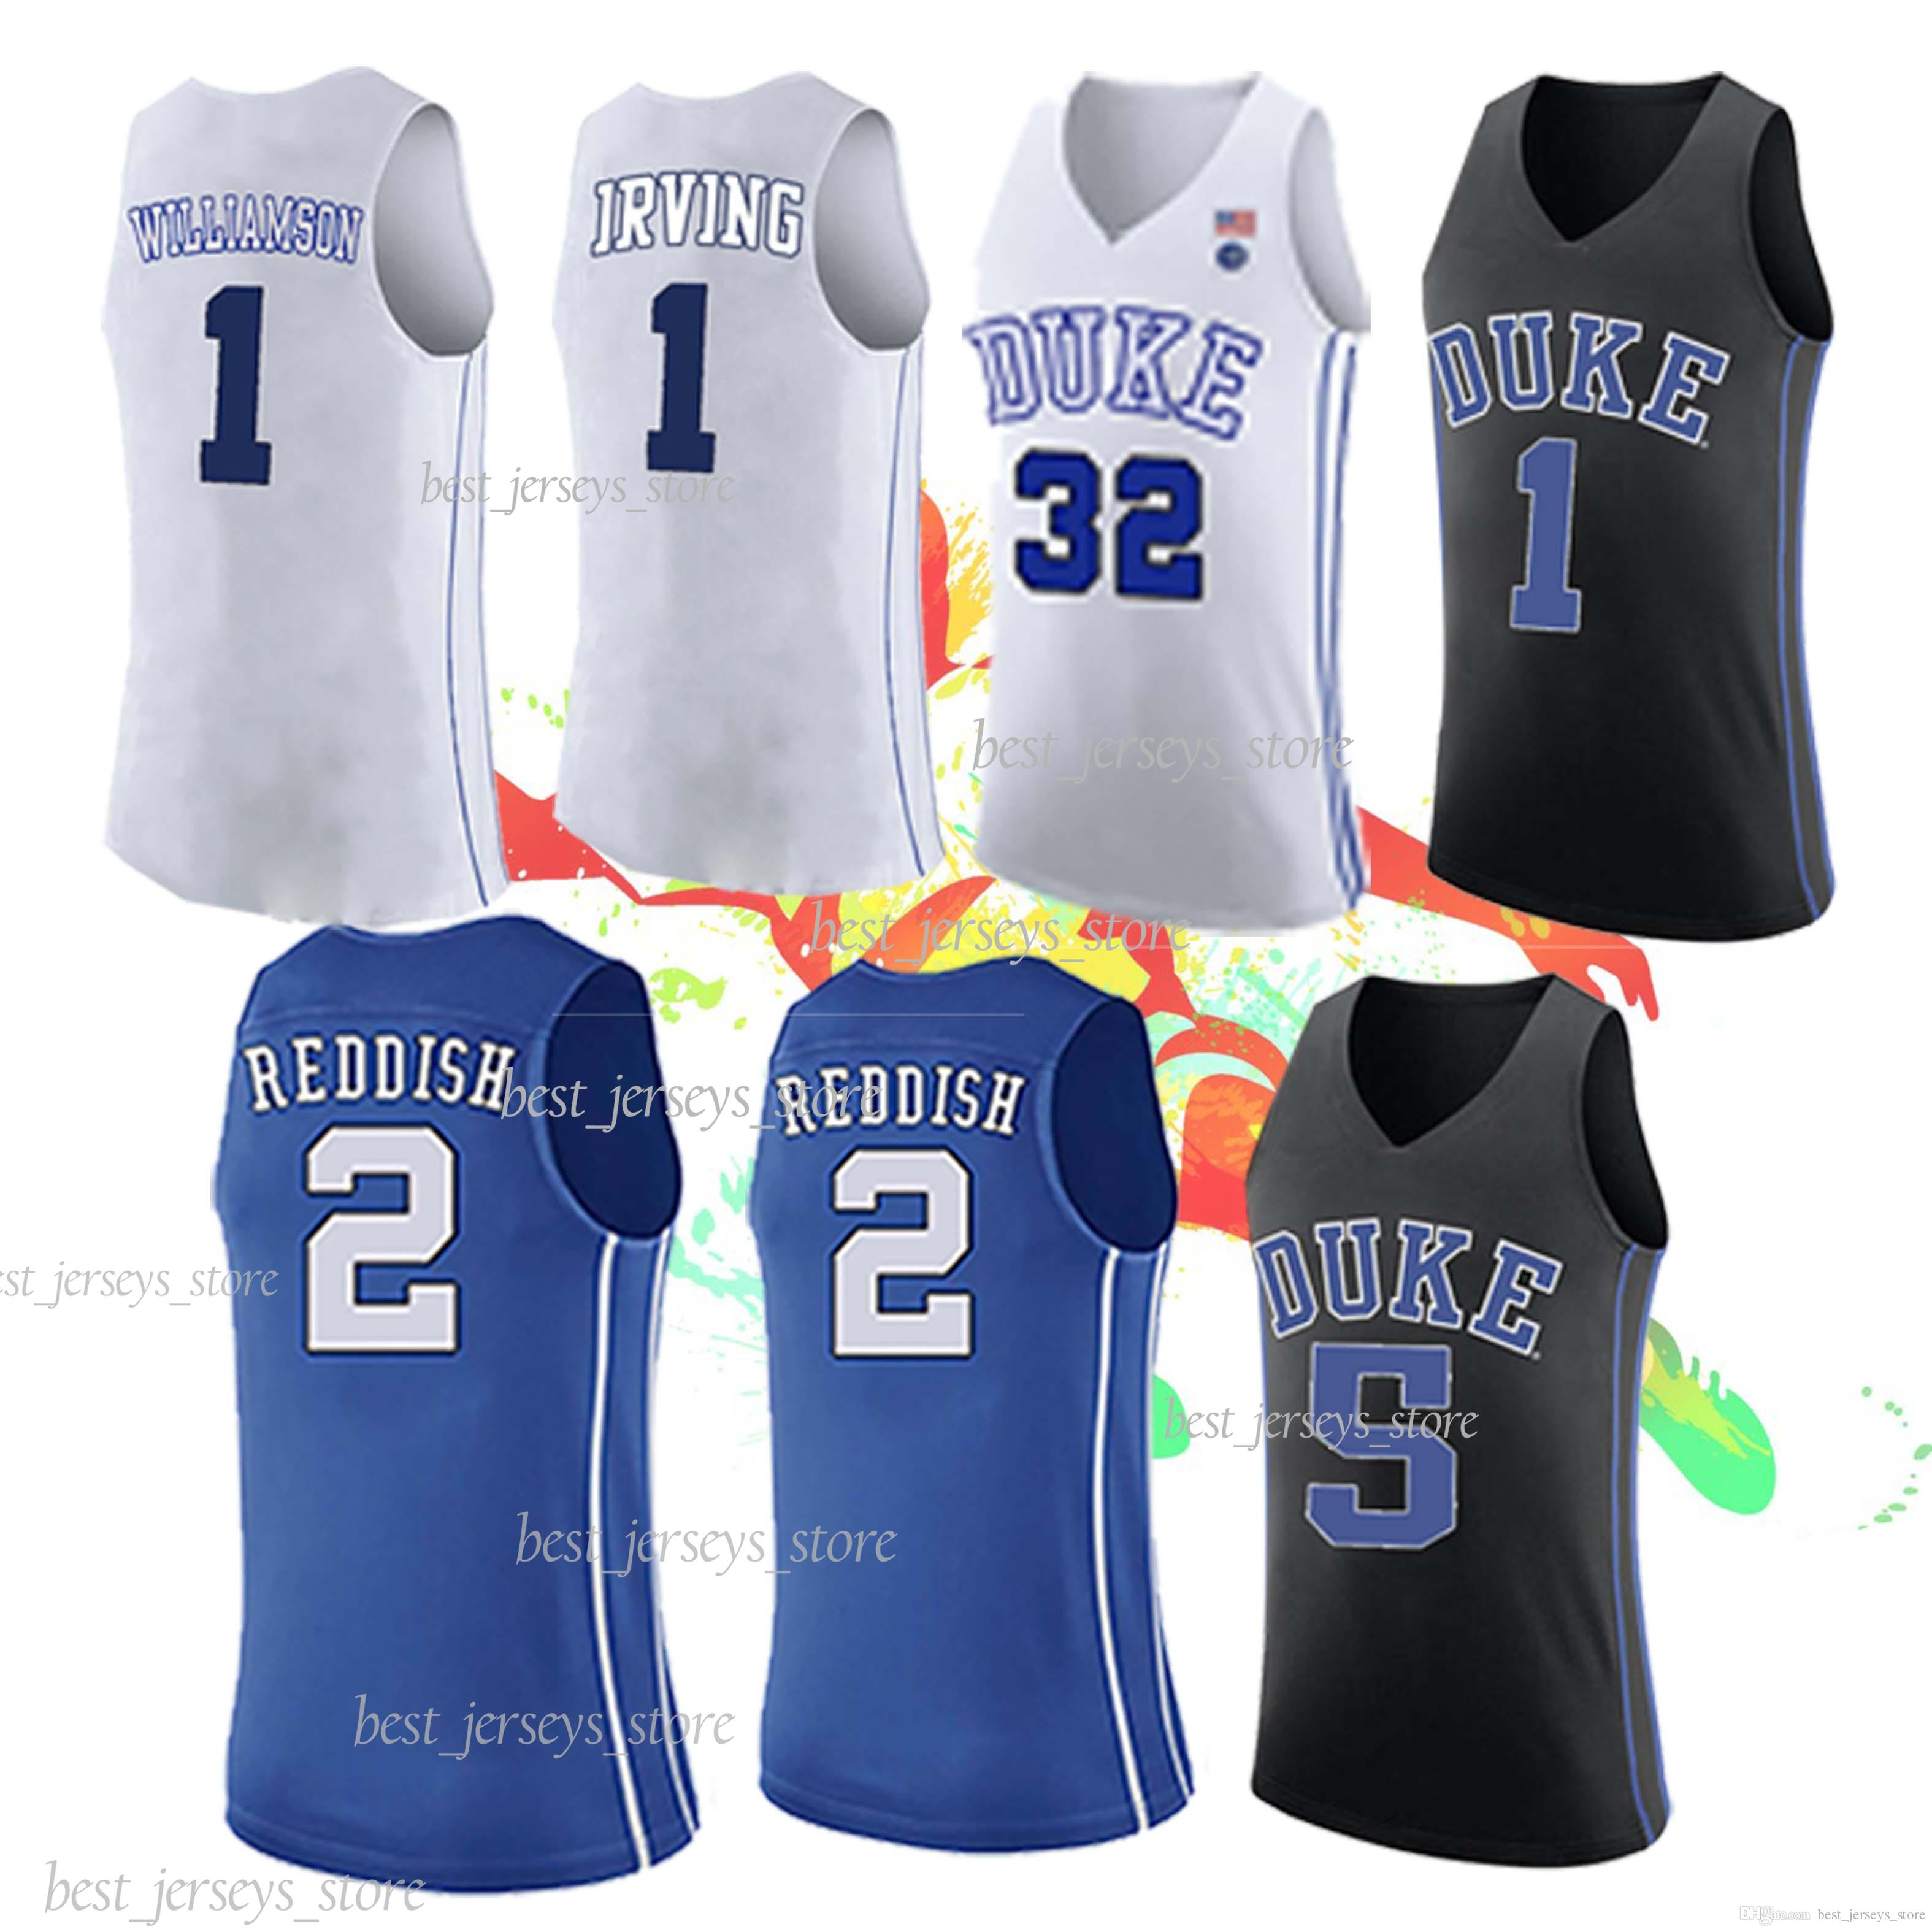 big sale f1096 fd203 4 REDICK NCAA 32 LAETTNER jerseys 2 Cam Reddish Duke 1 Zion Williamson Hot  sale Jersey sportswear